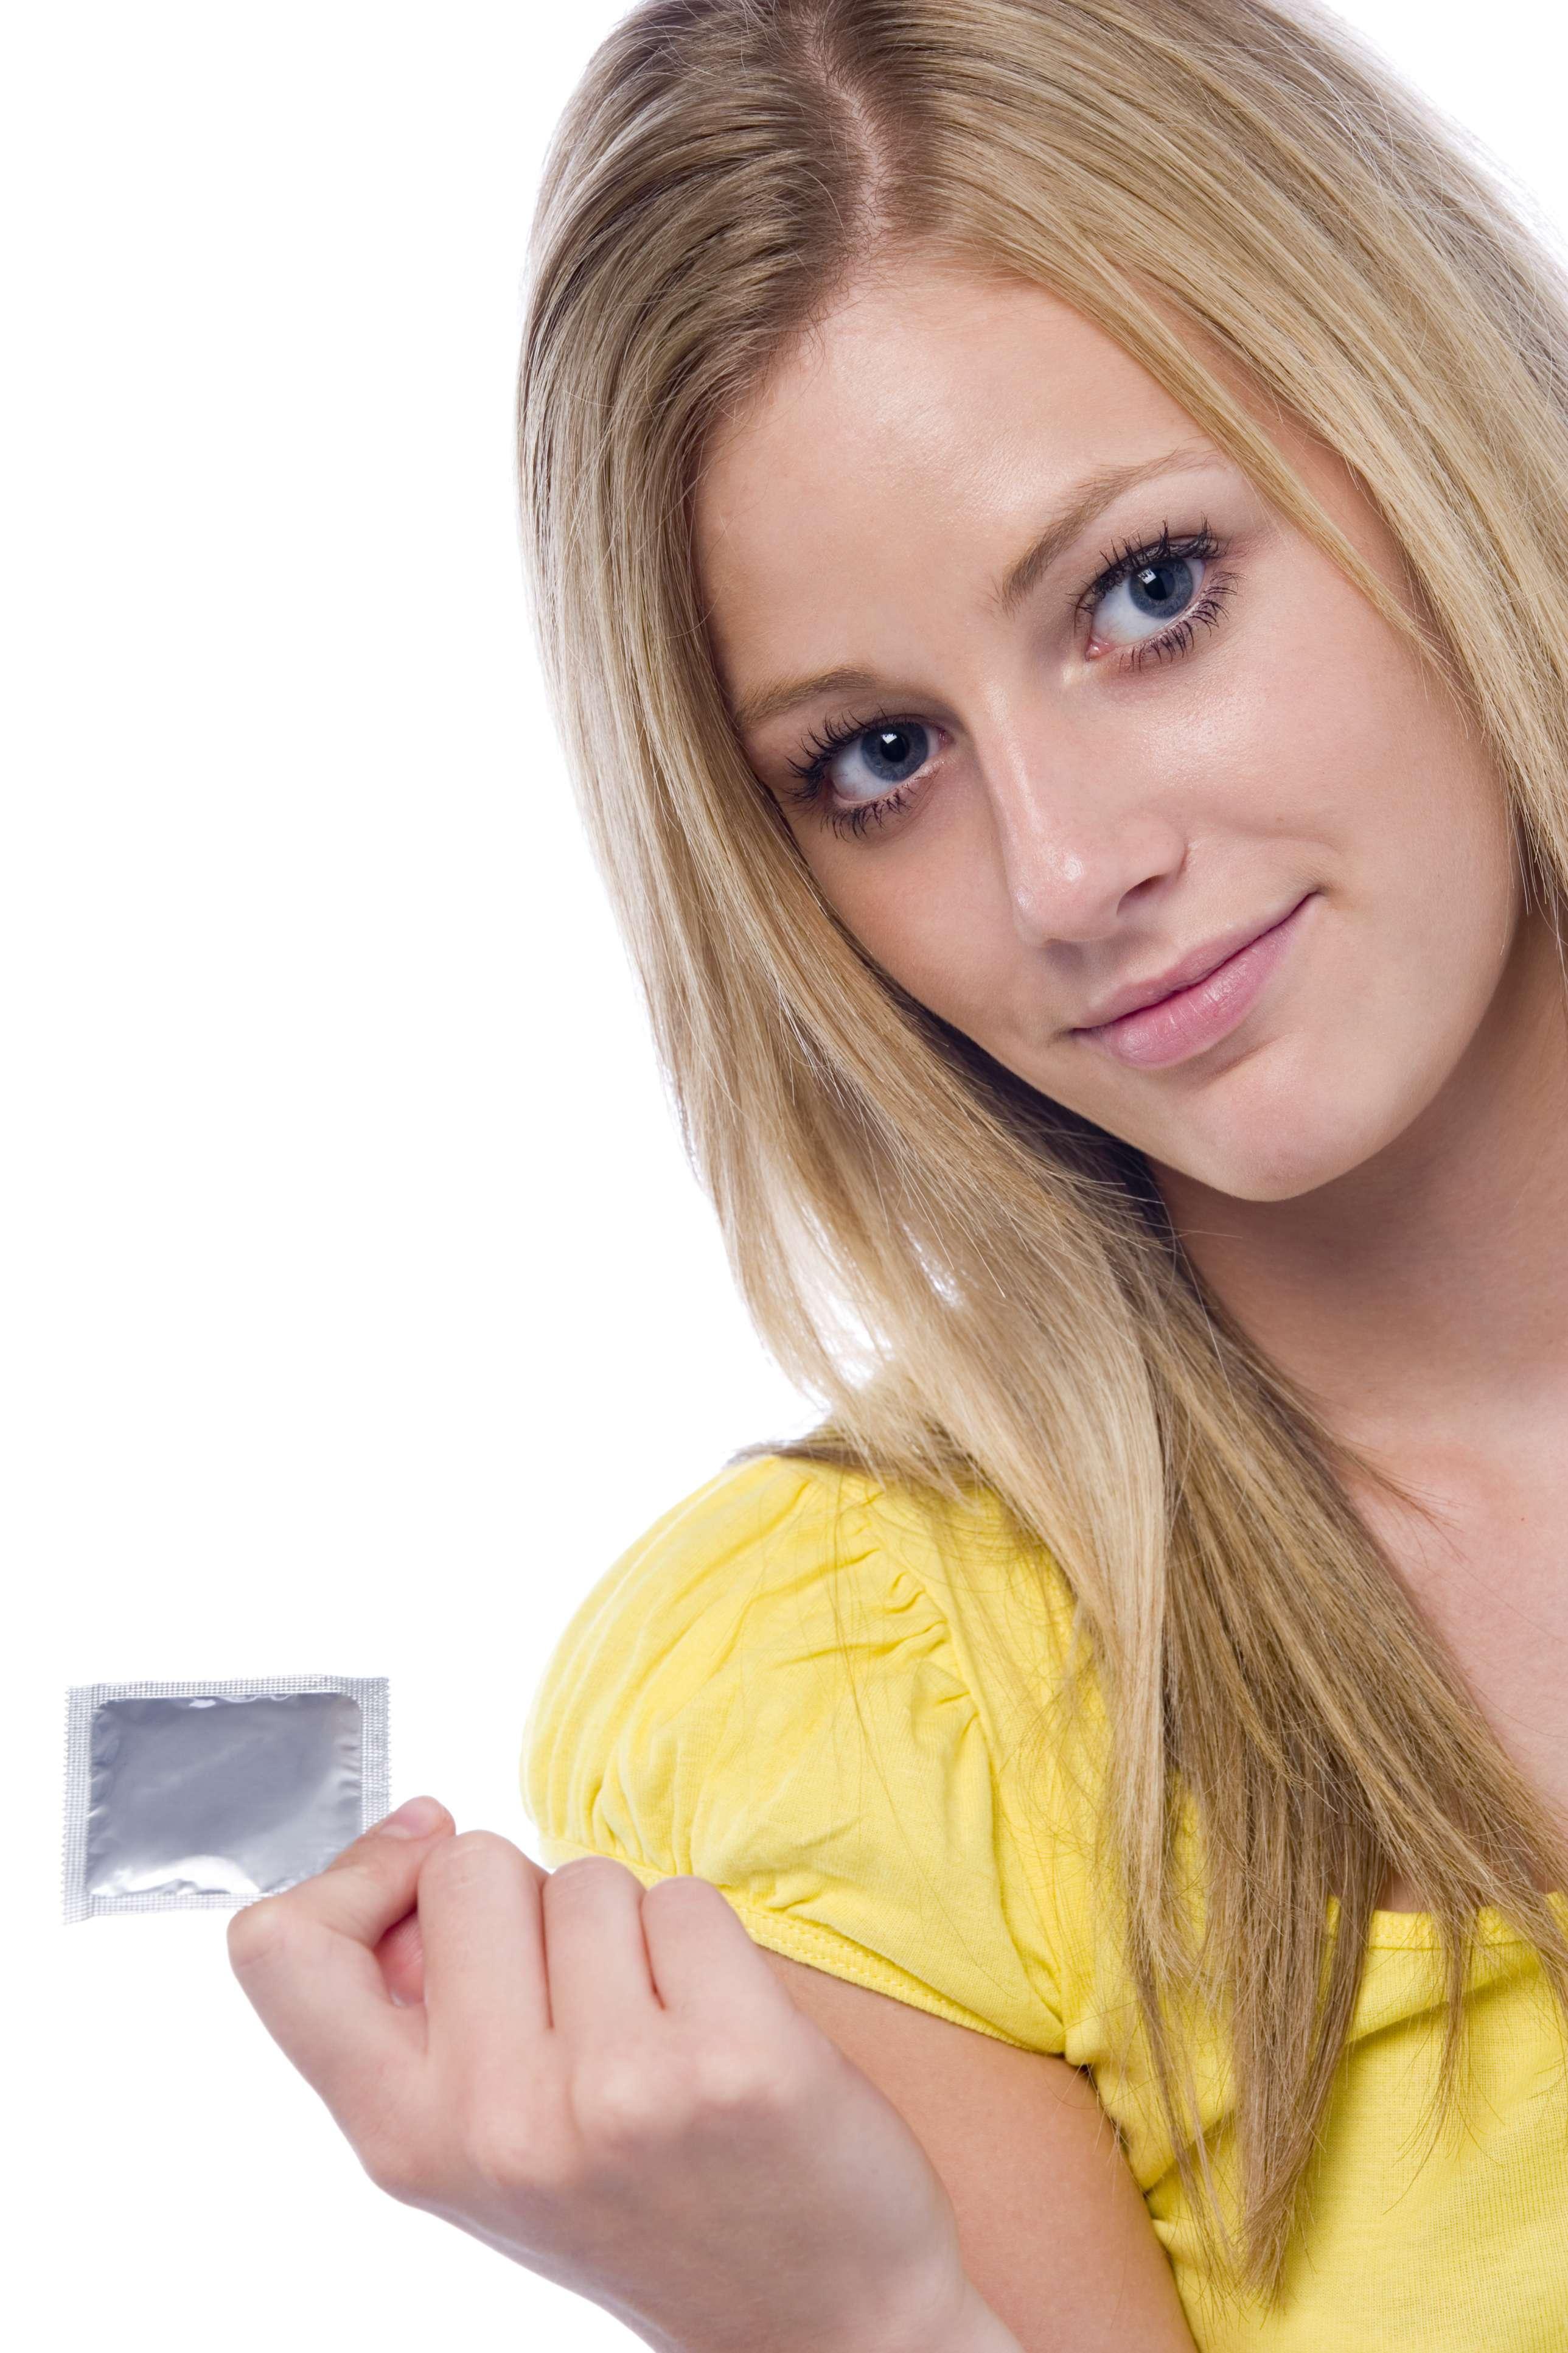 Novo contraceptivo de nanofibras promete revolucionar ...